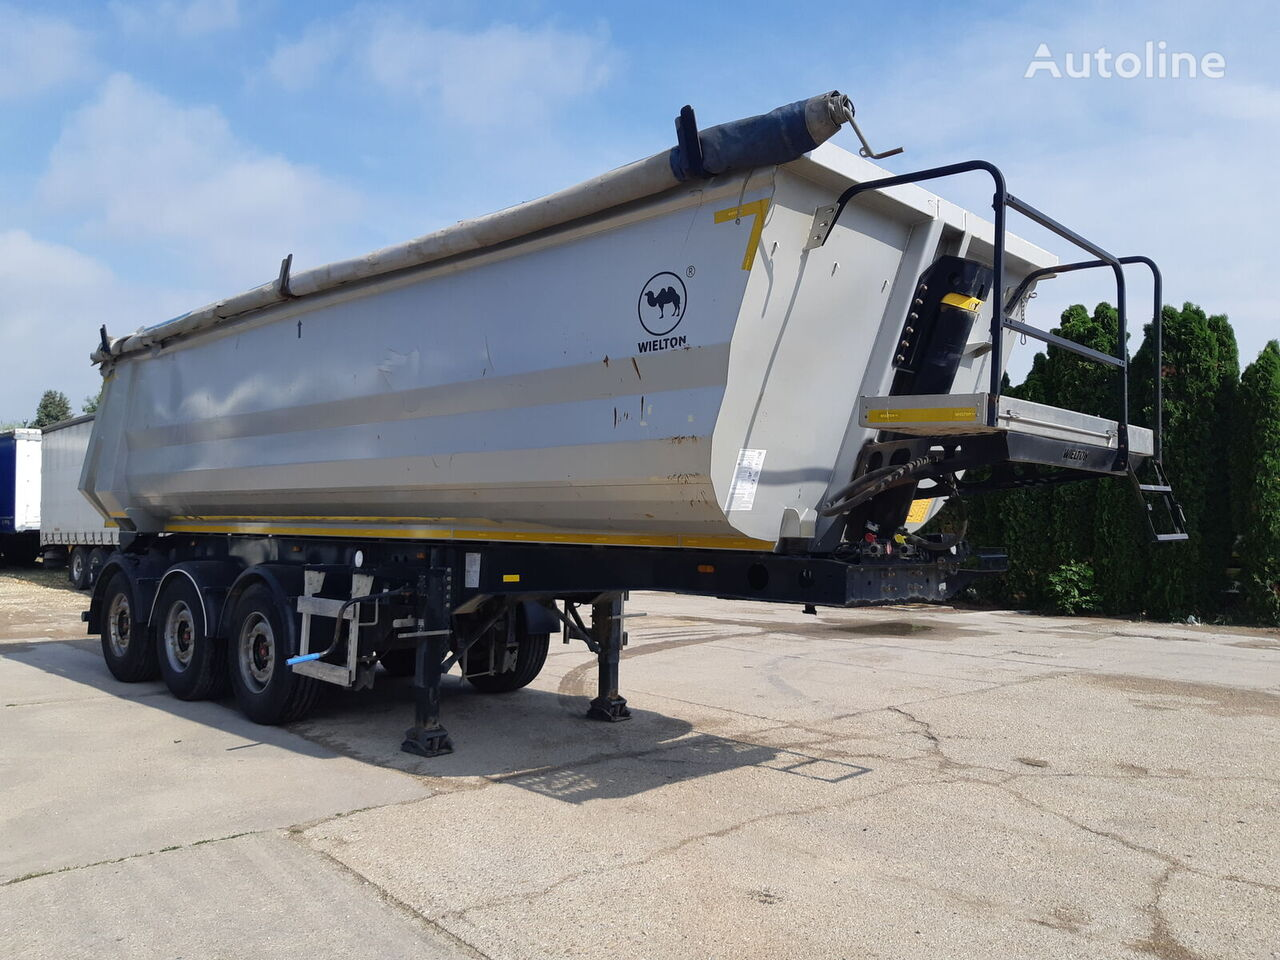 WIELTON NW3 Lift Axl 32m2 tipper semi-trailer